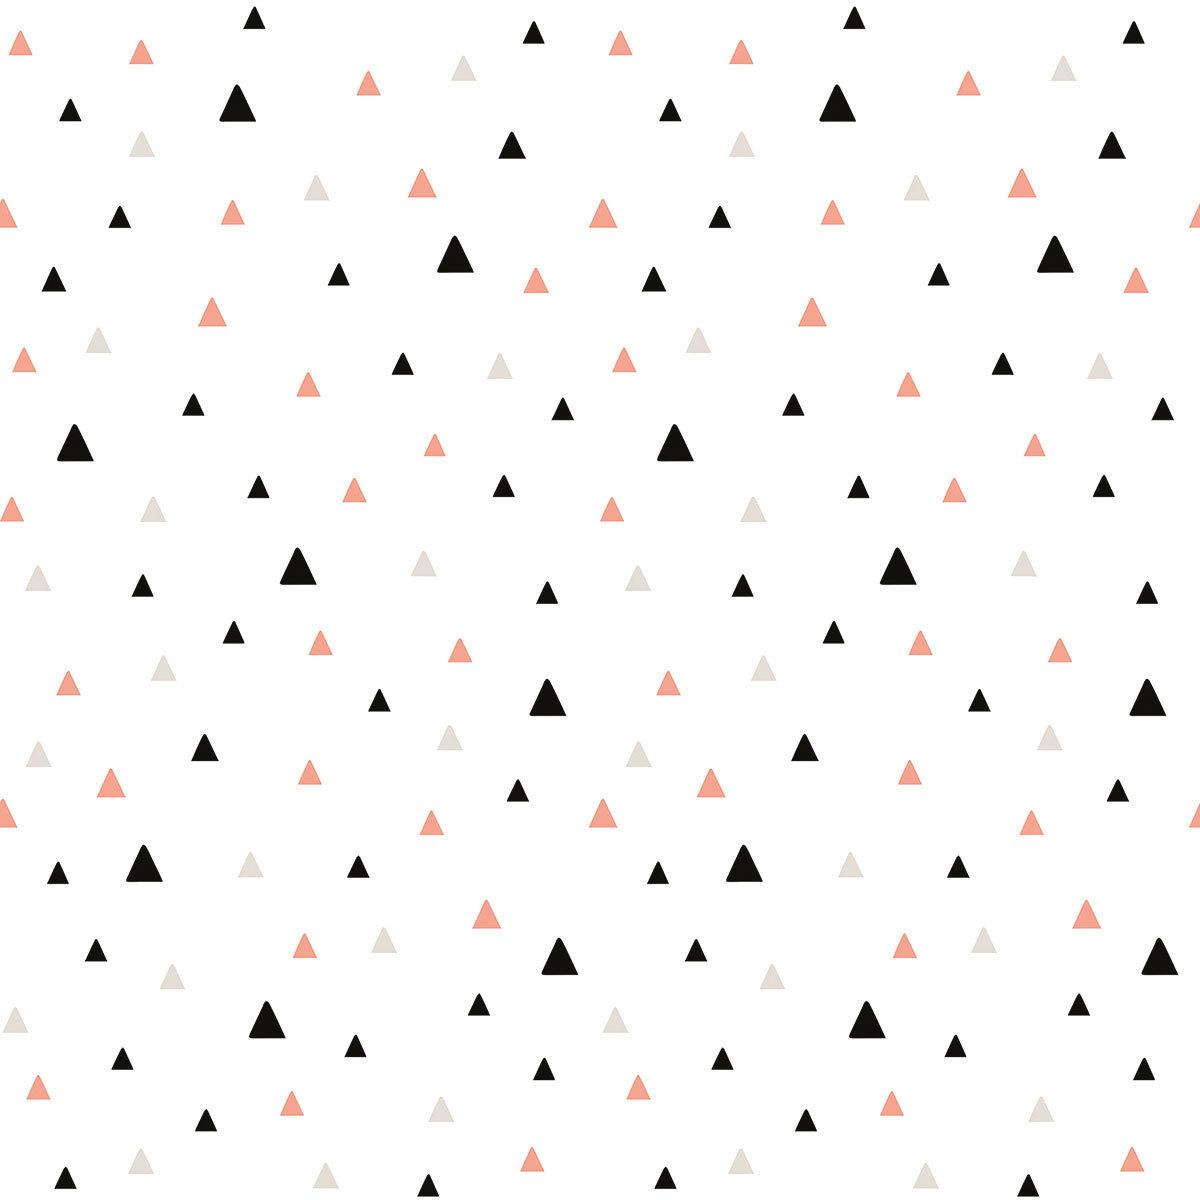 Lilipinso Origami Play Papier Peint Petits Triangles Noir